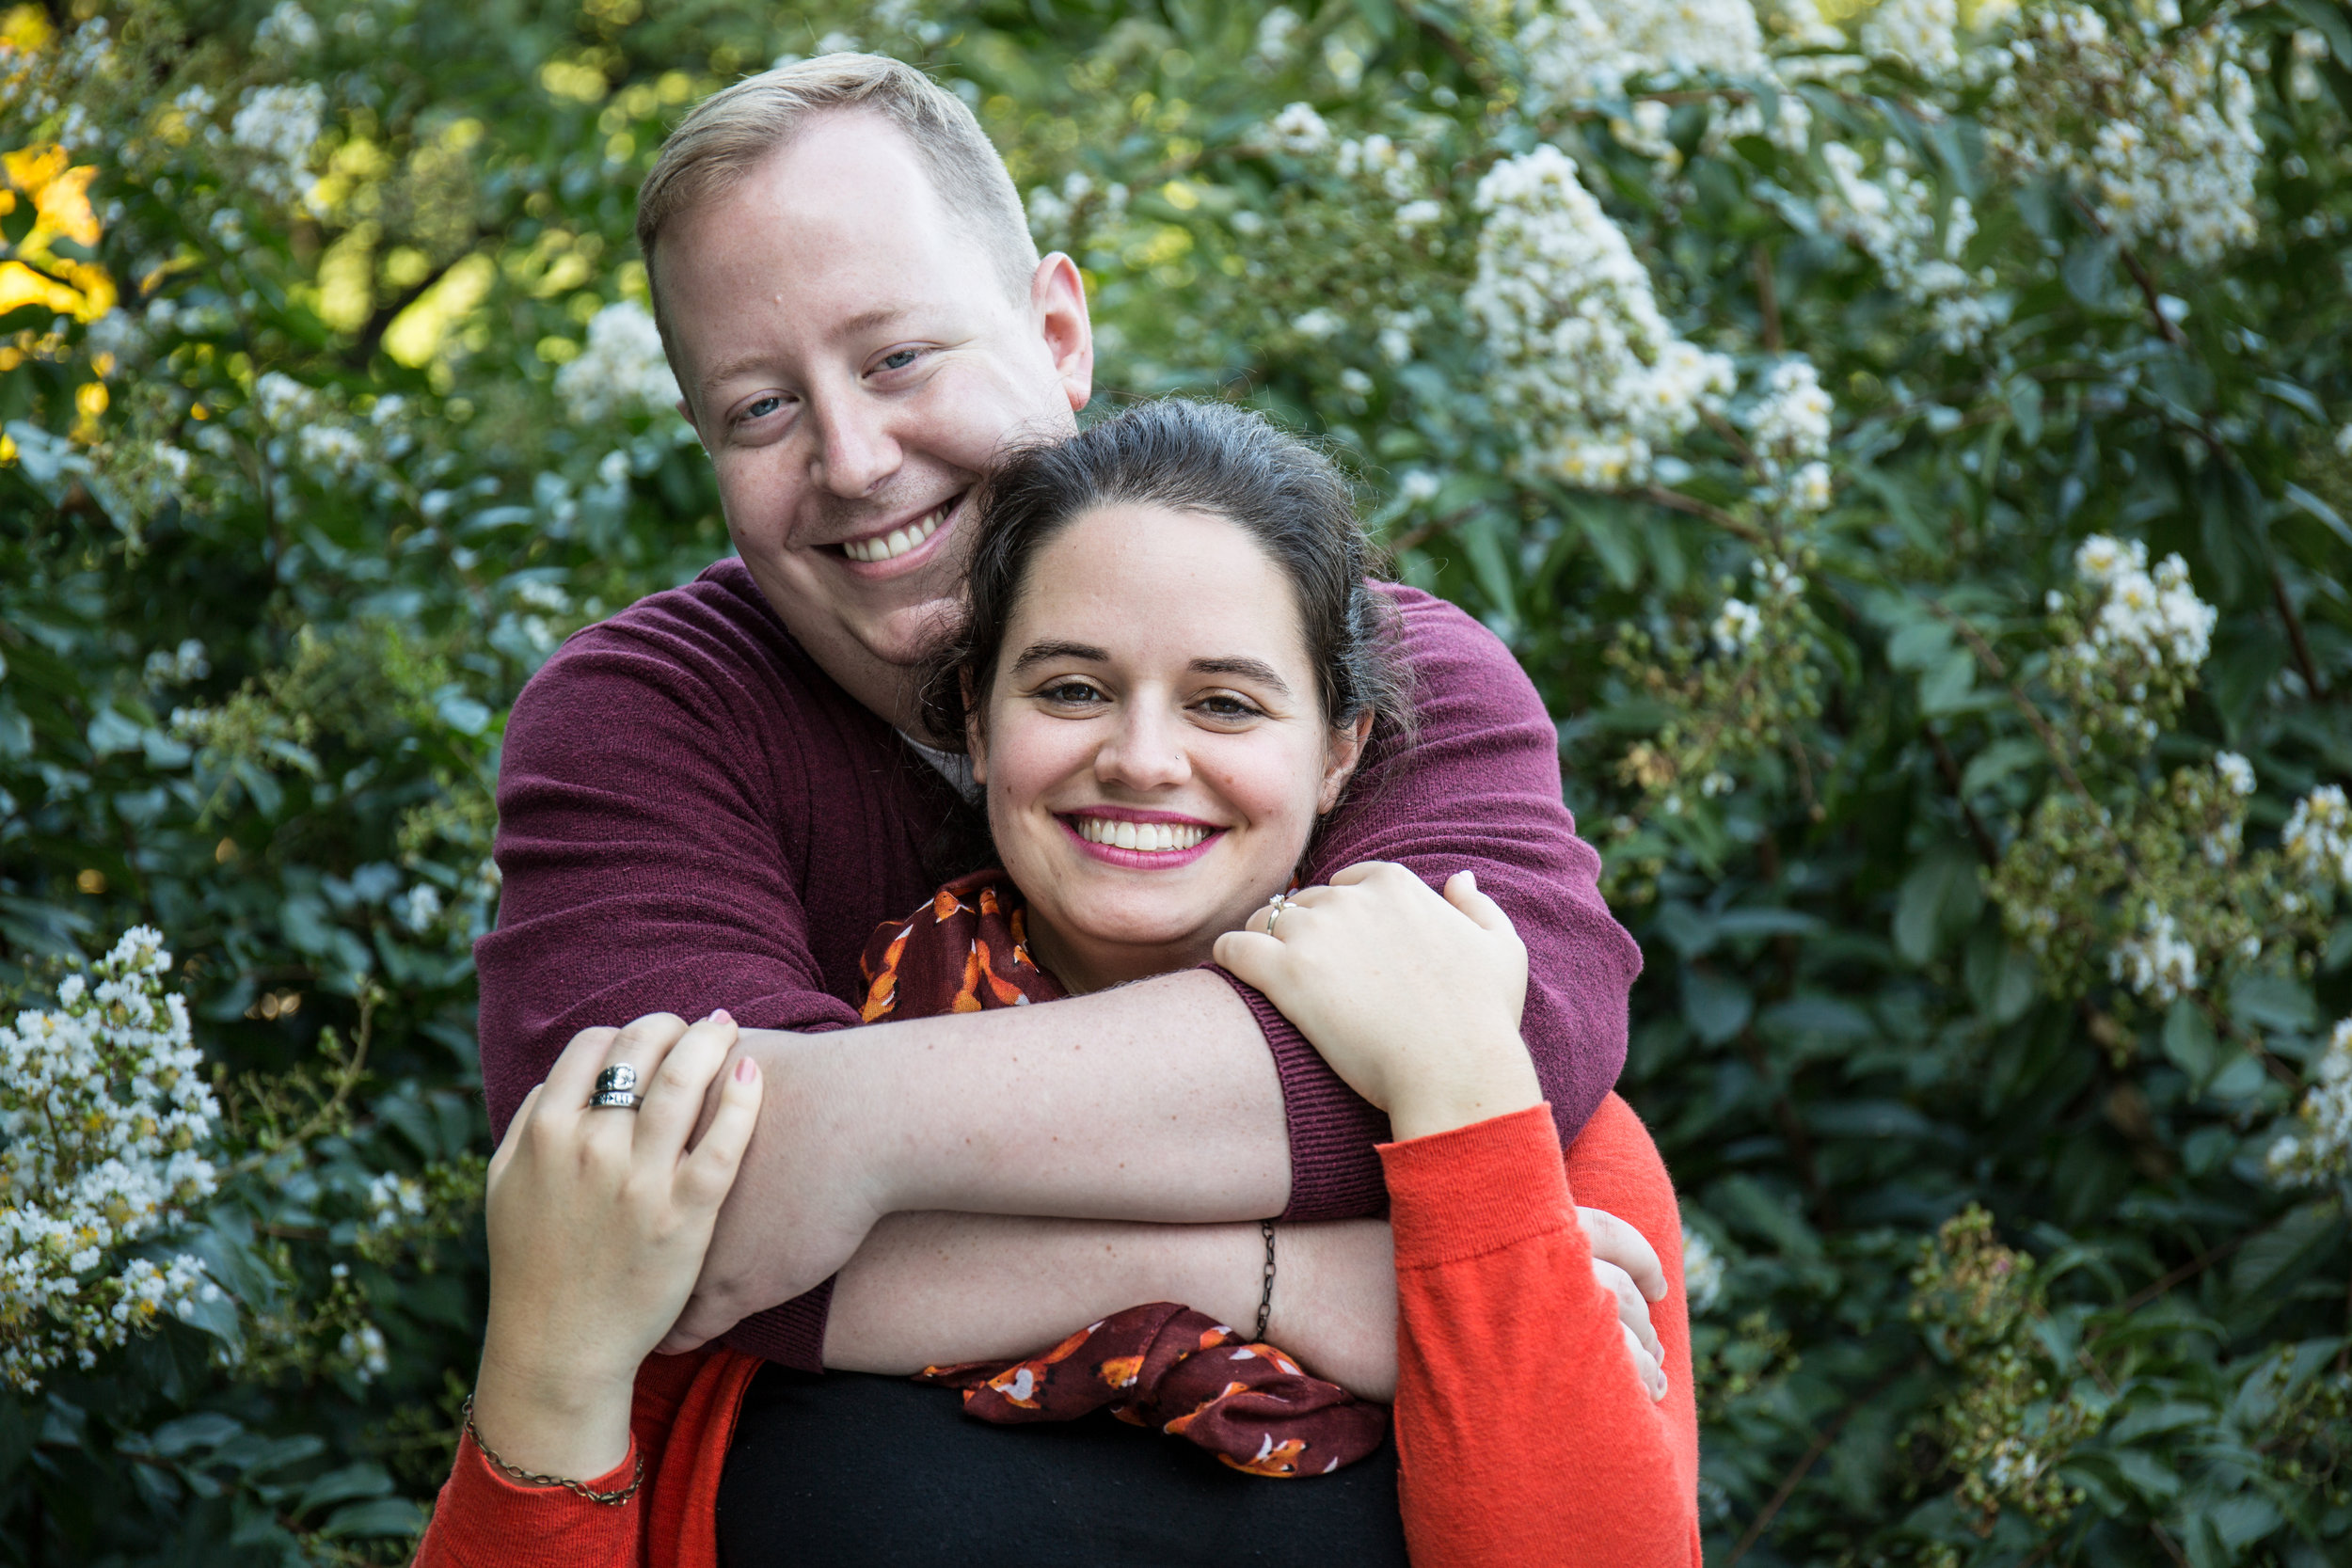 Phil and Becca-5552.jpg